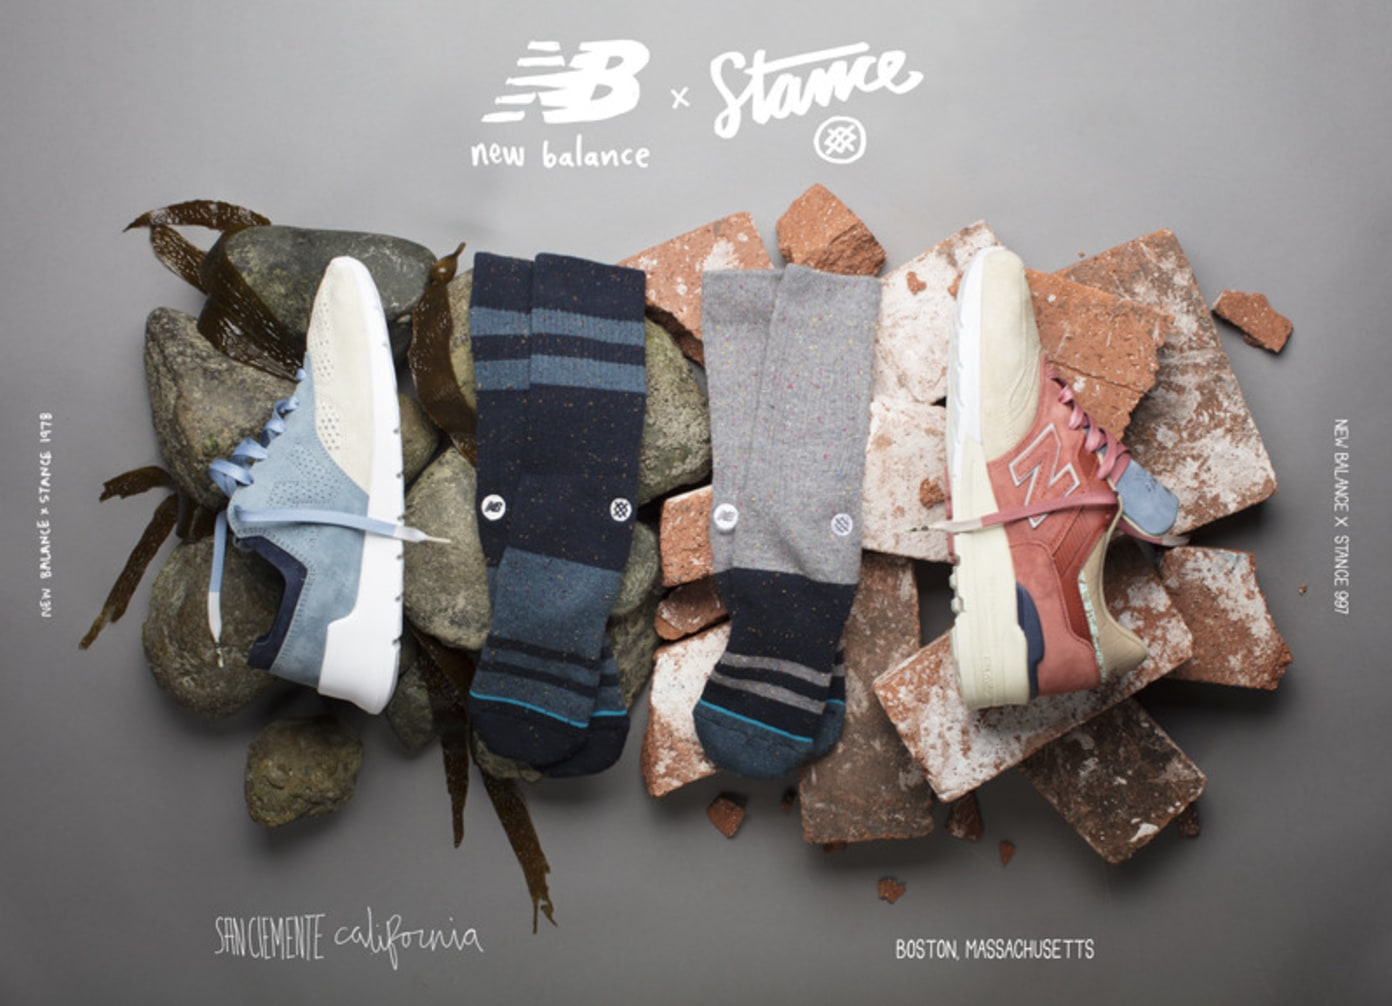 new balance x stance 997